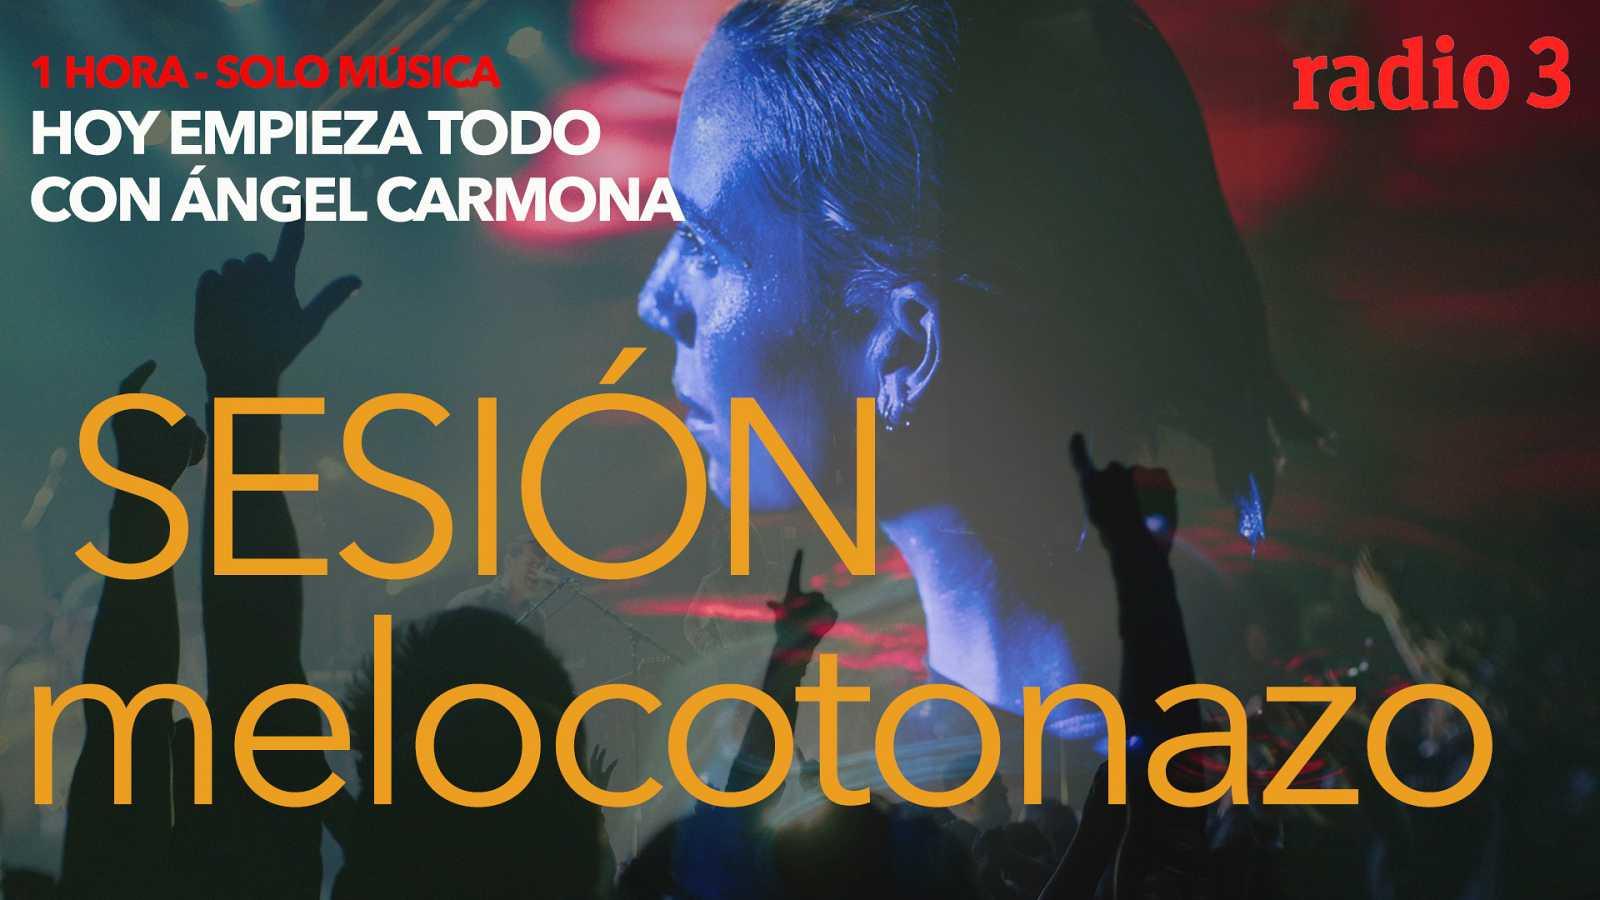 "Hoy empieza todo con Ángel Carmona -  #SesiónMelocotonazo"": Paul Simon, Lykke Li, Vetusta Morla...- 13/10/20 - escuchar ahora"